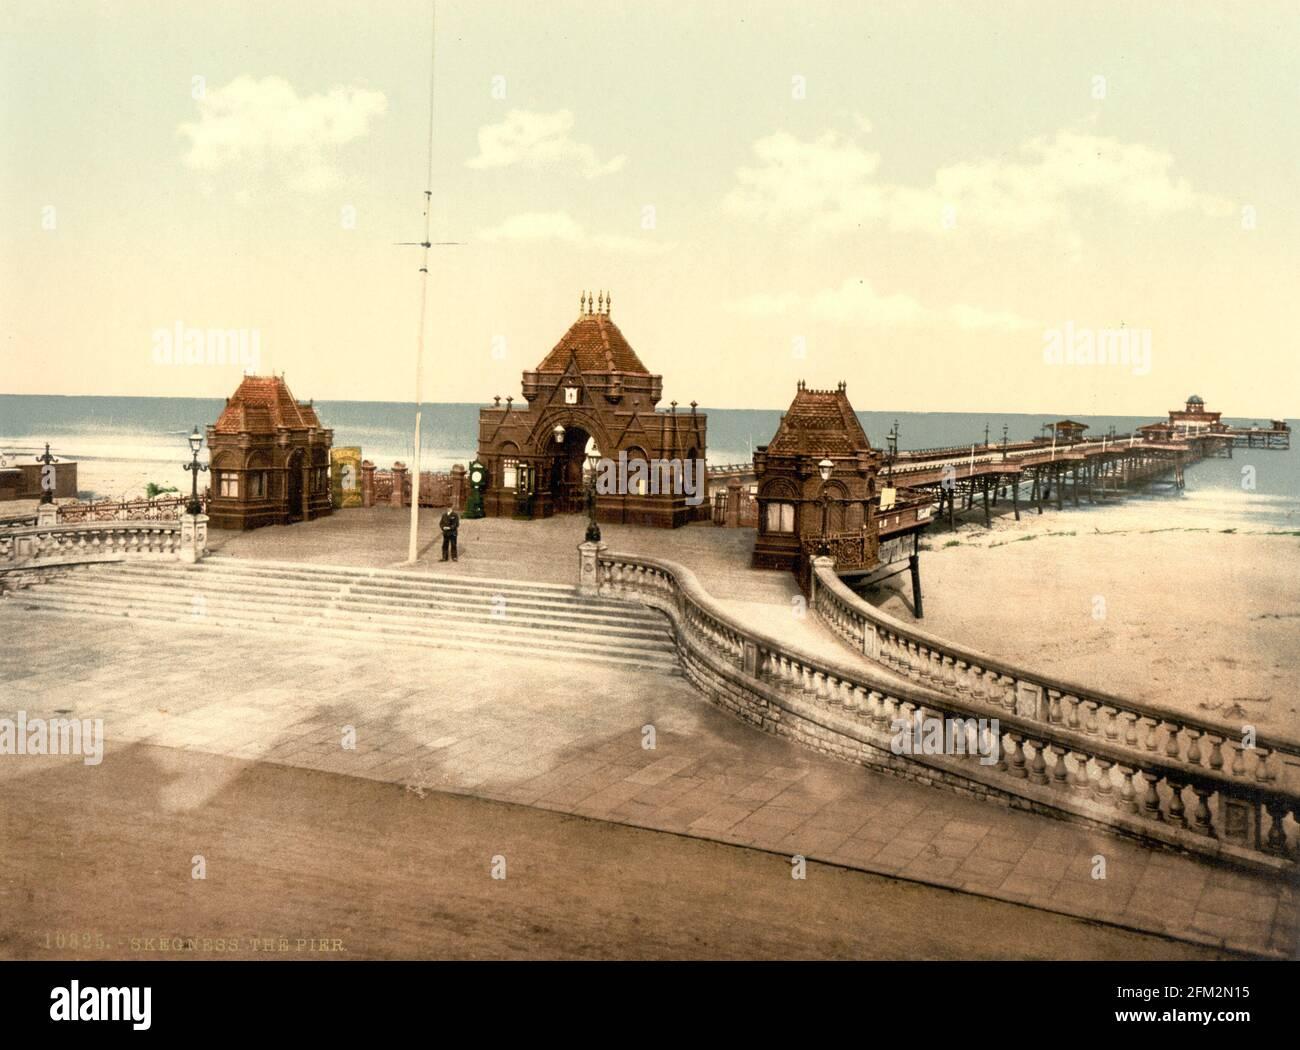 Skegness Pier, Lincolnshire vers 1890-1900 Banque D'Images